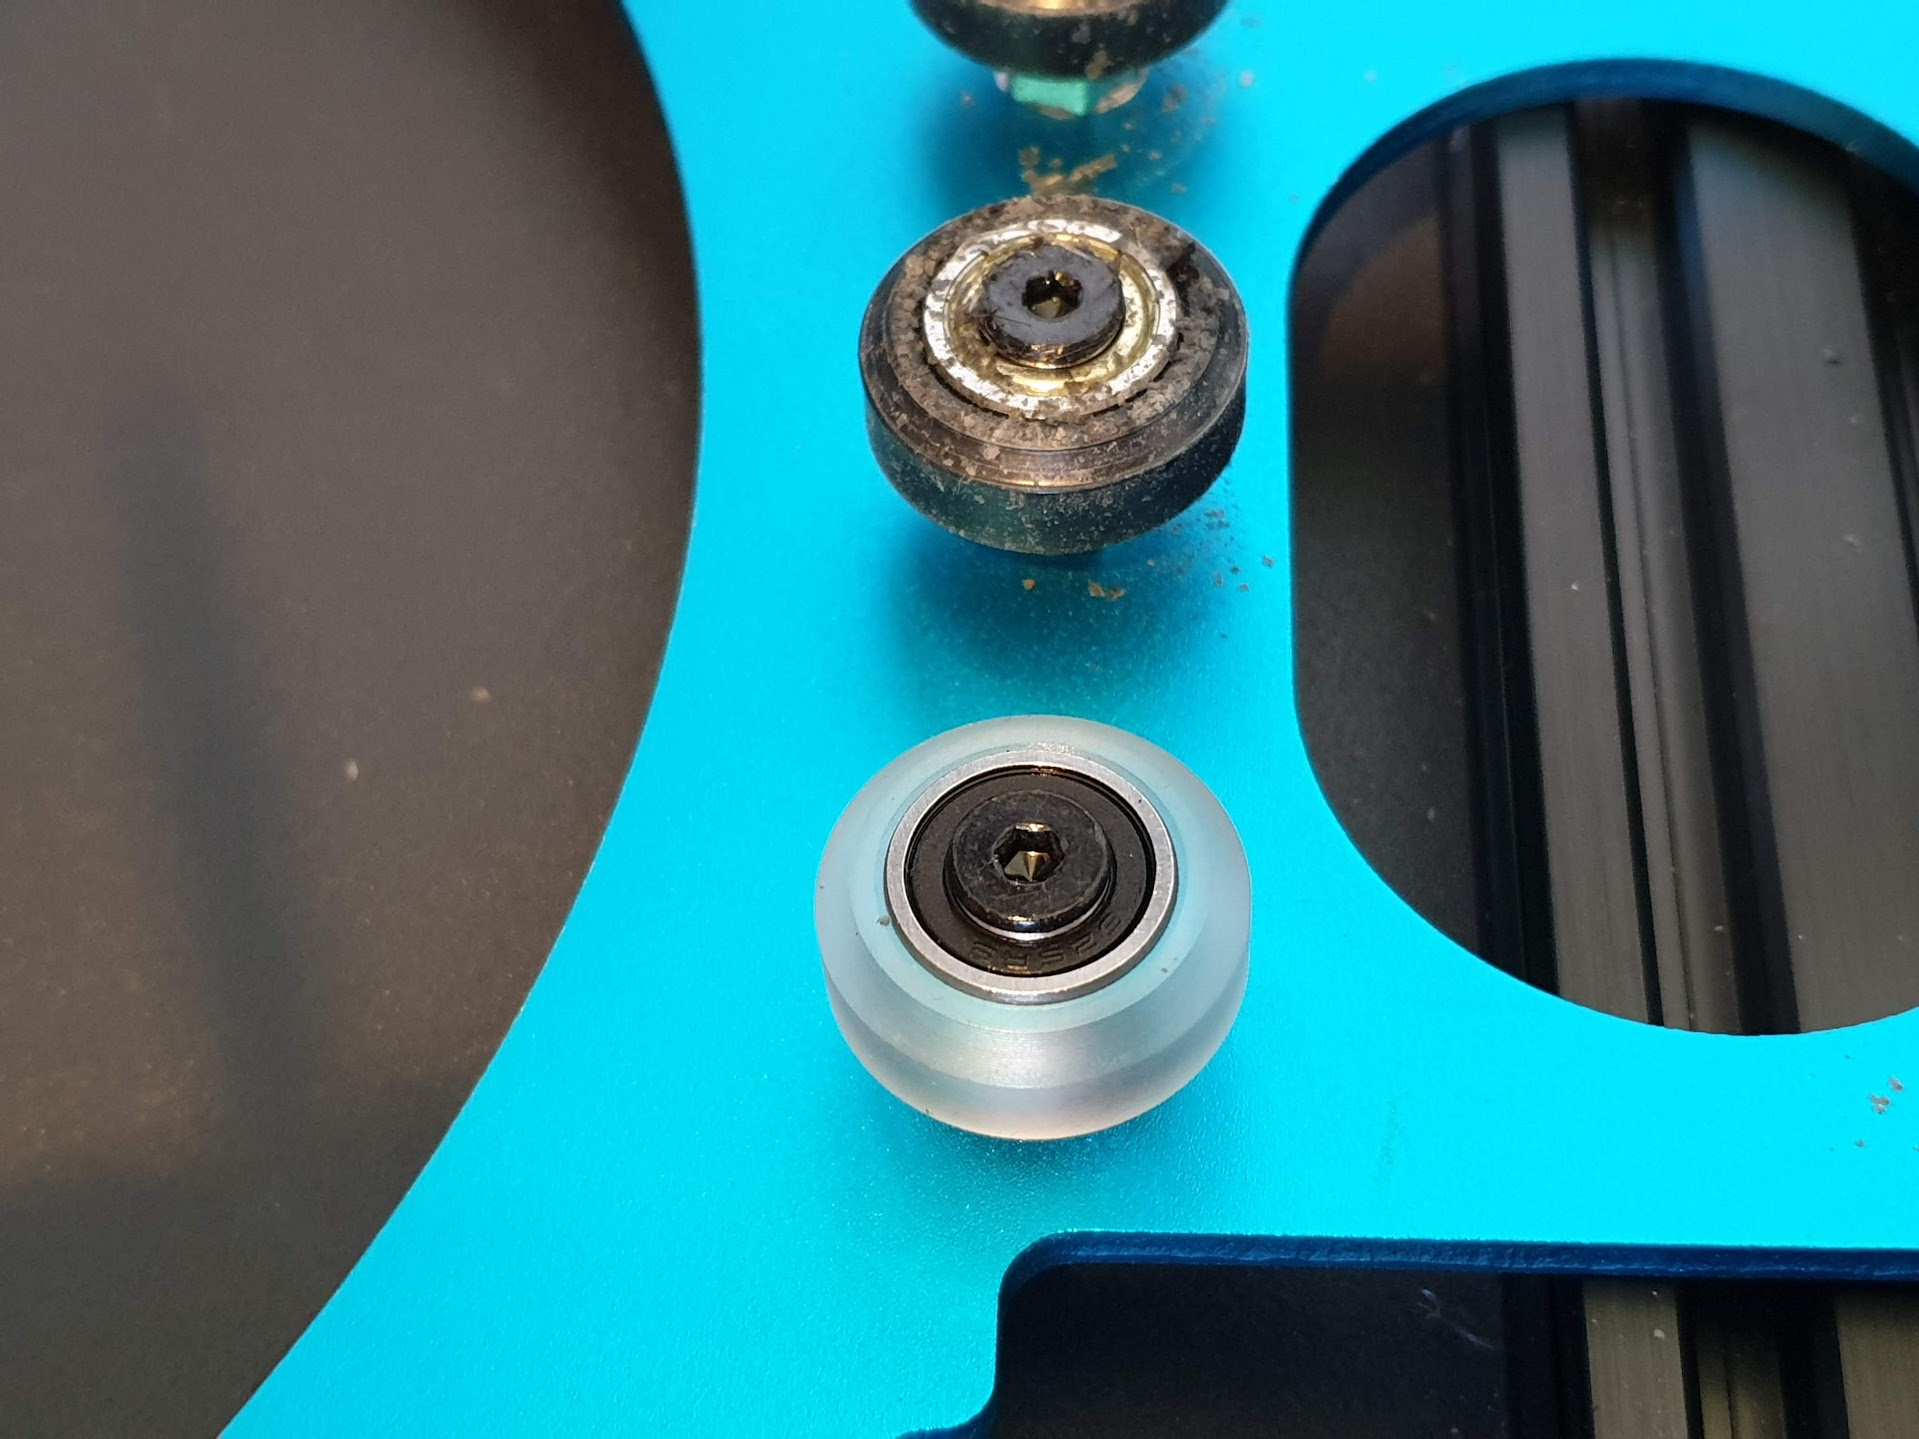 Polycarbonate-V-Slot-Wheels-Sidewinder-X1-upgrades-3